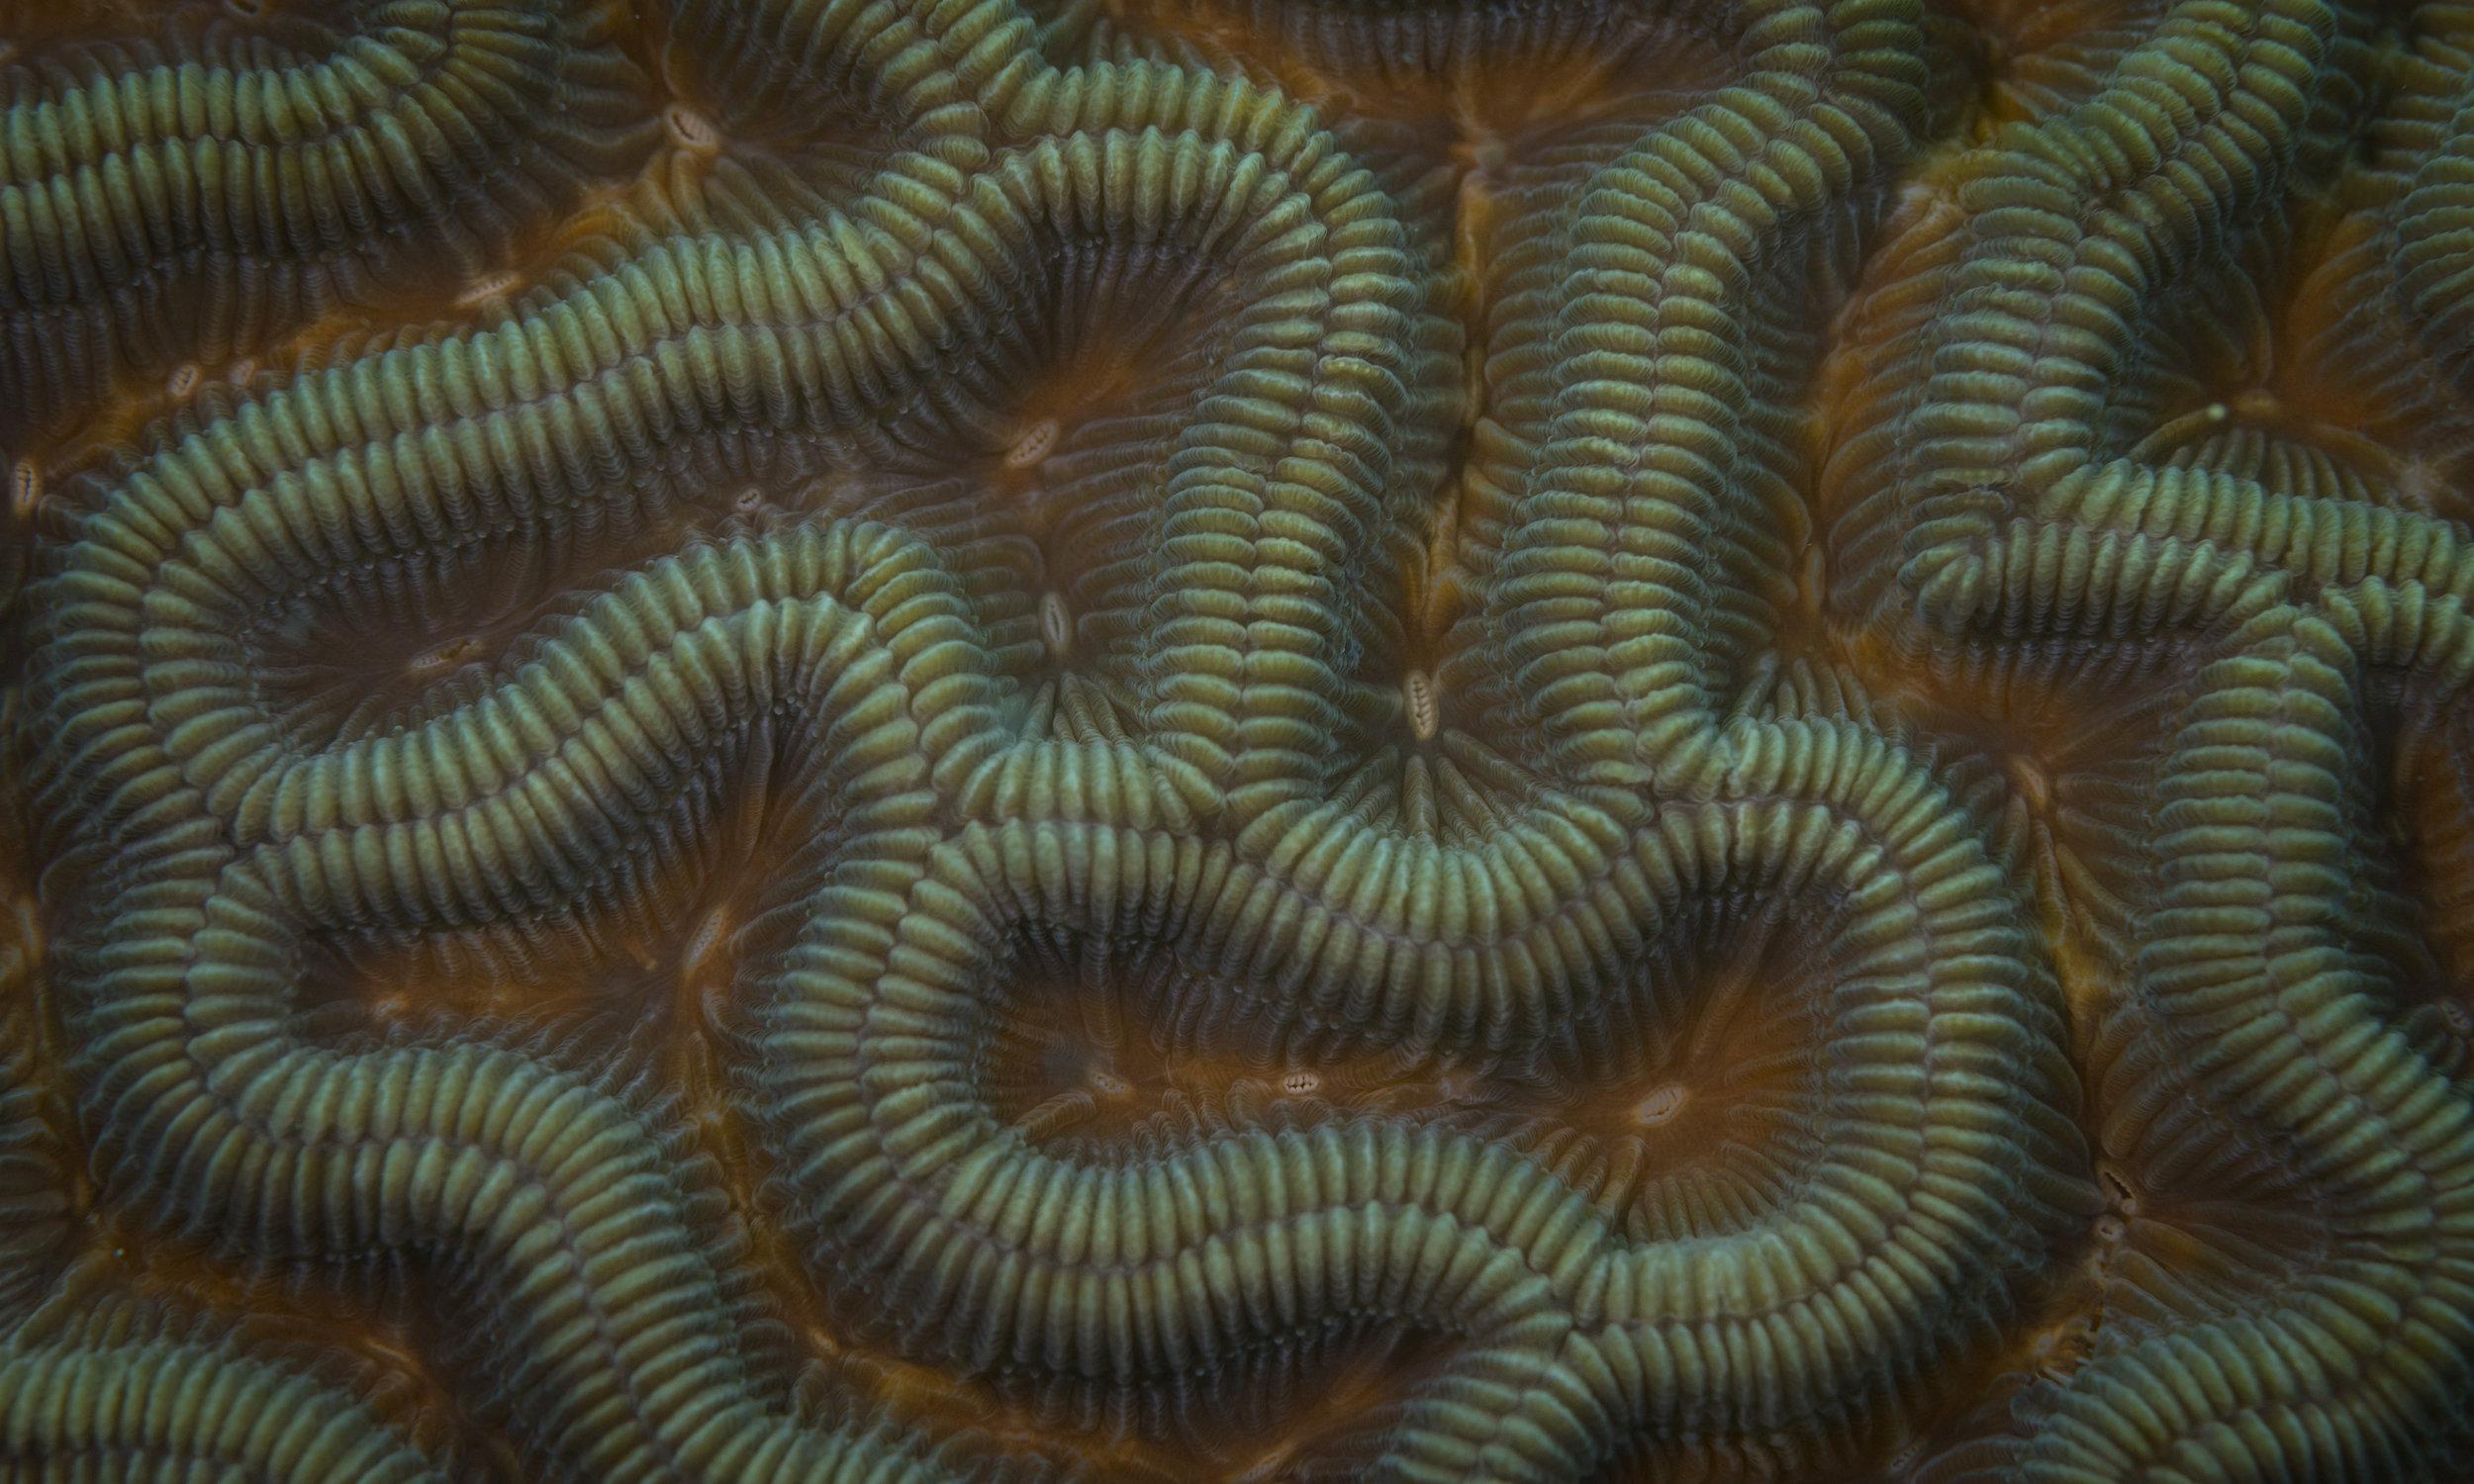 Colpophyllia natans  - Boulder Brain Coral